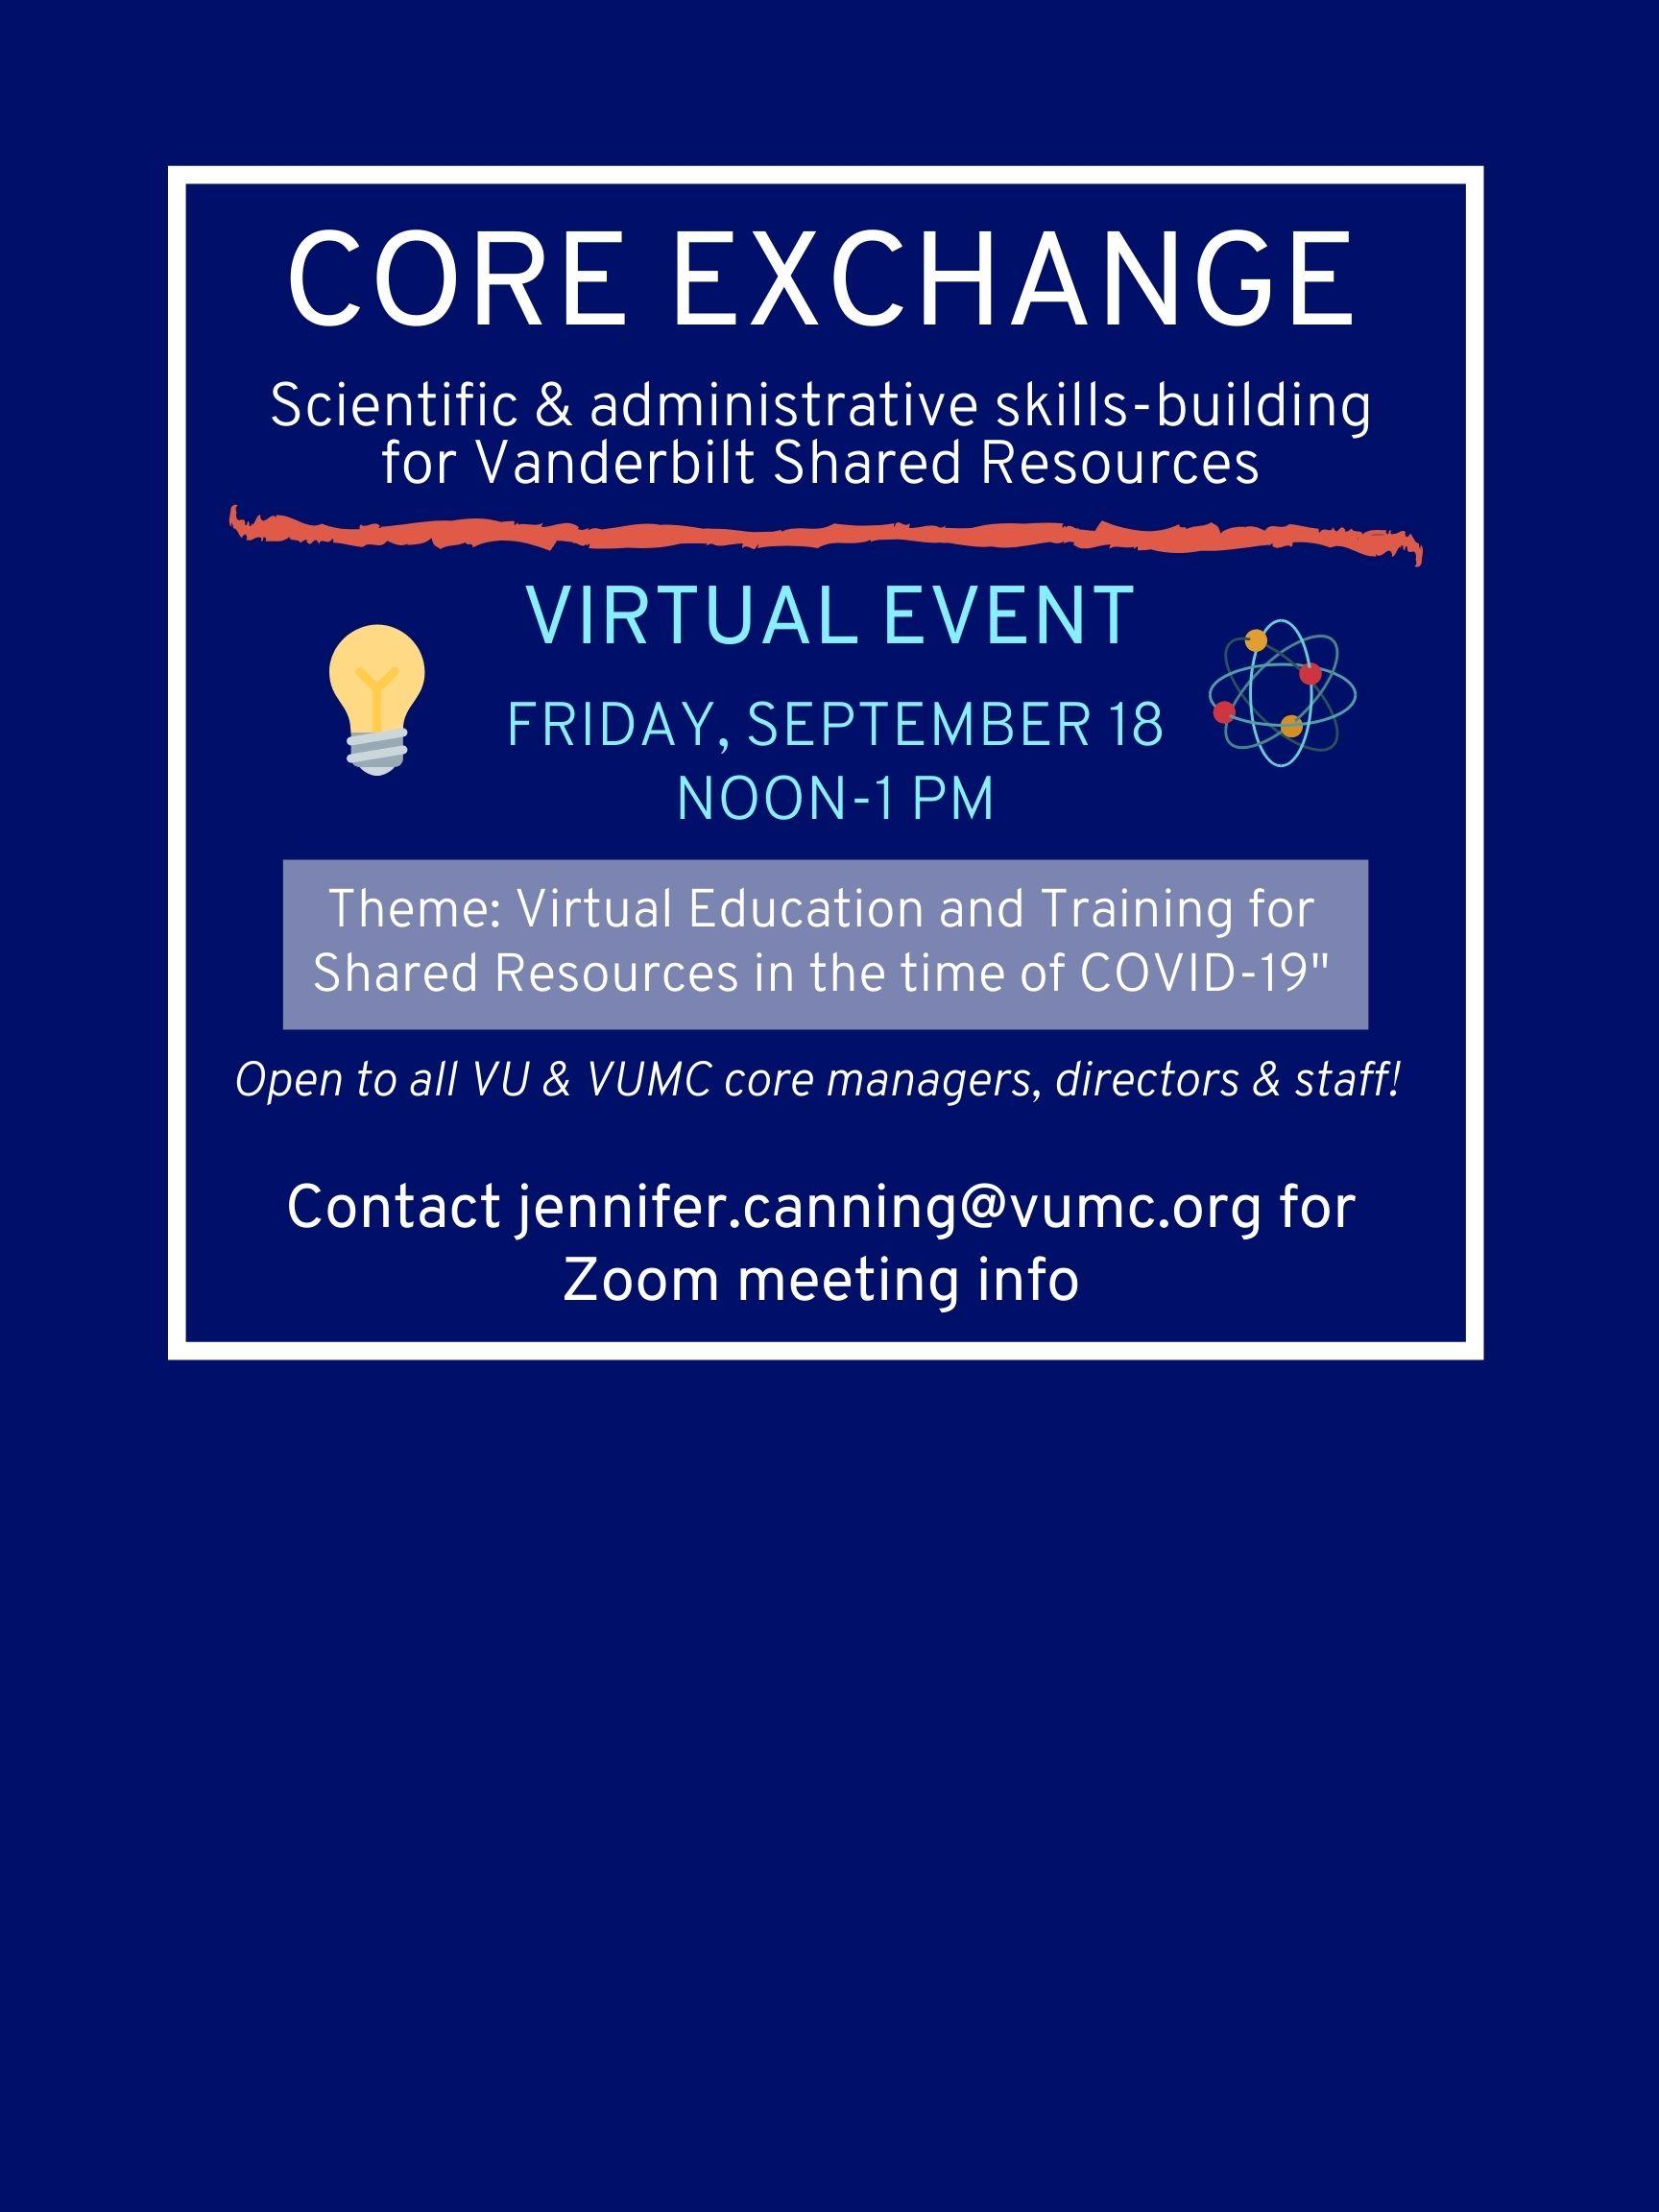 September 18,2020 Core Exchange Event Flyer